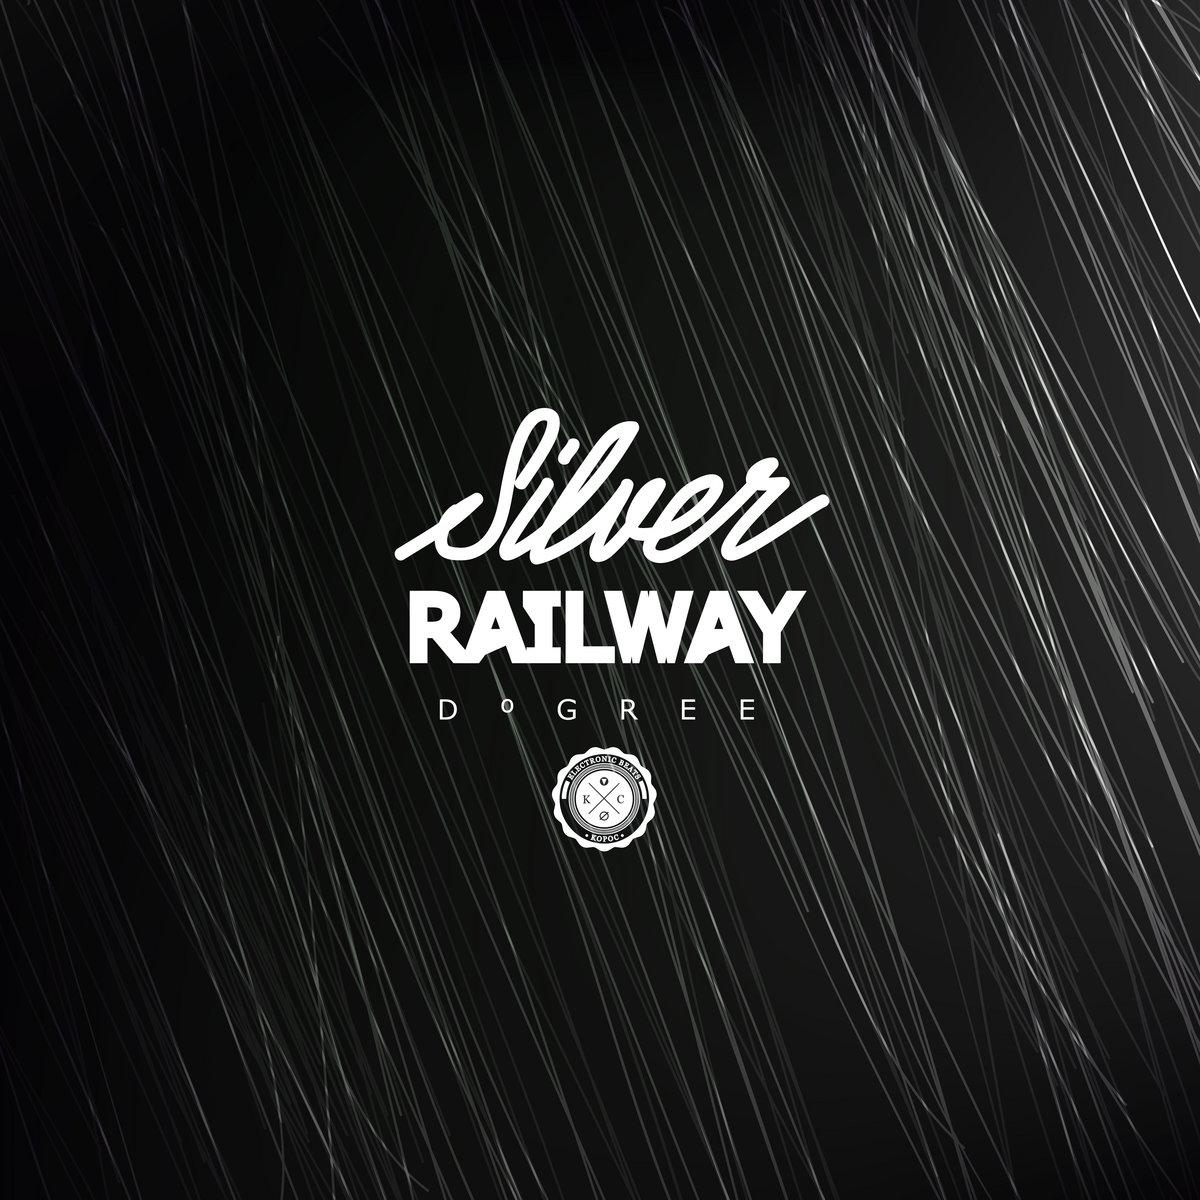 Dºgree : Silver Railway EP [KPL030] 1